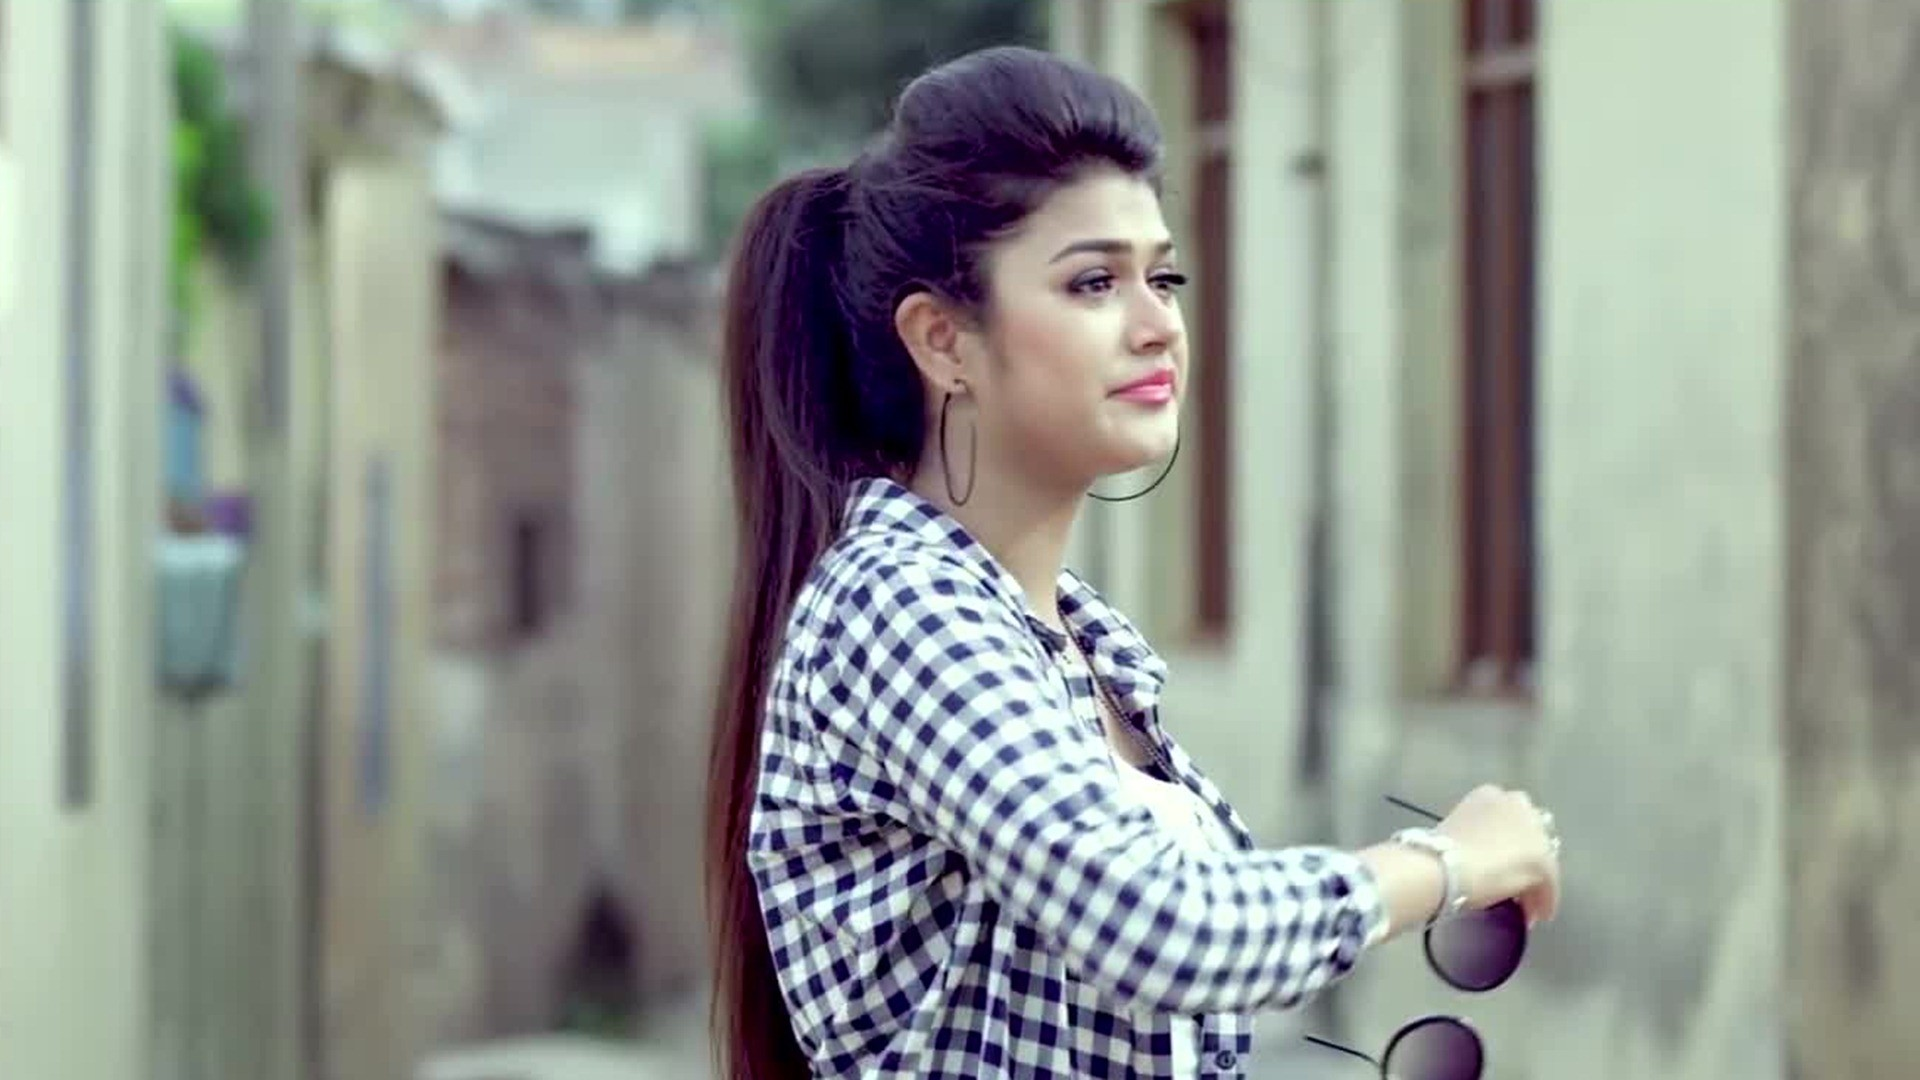 Beautiful Punjabi Girl Widescreen Wallpapers 12551 Punjabi Girls Wallpaper Download 1920x1080 Download Hd Wallpaper Wallpapertip